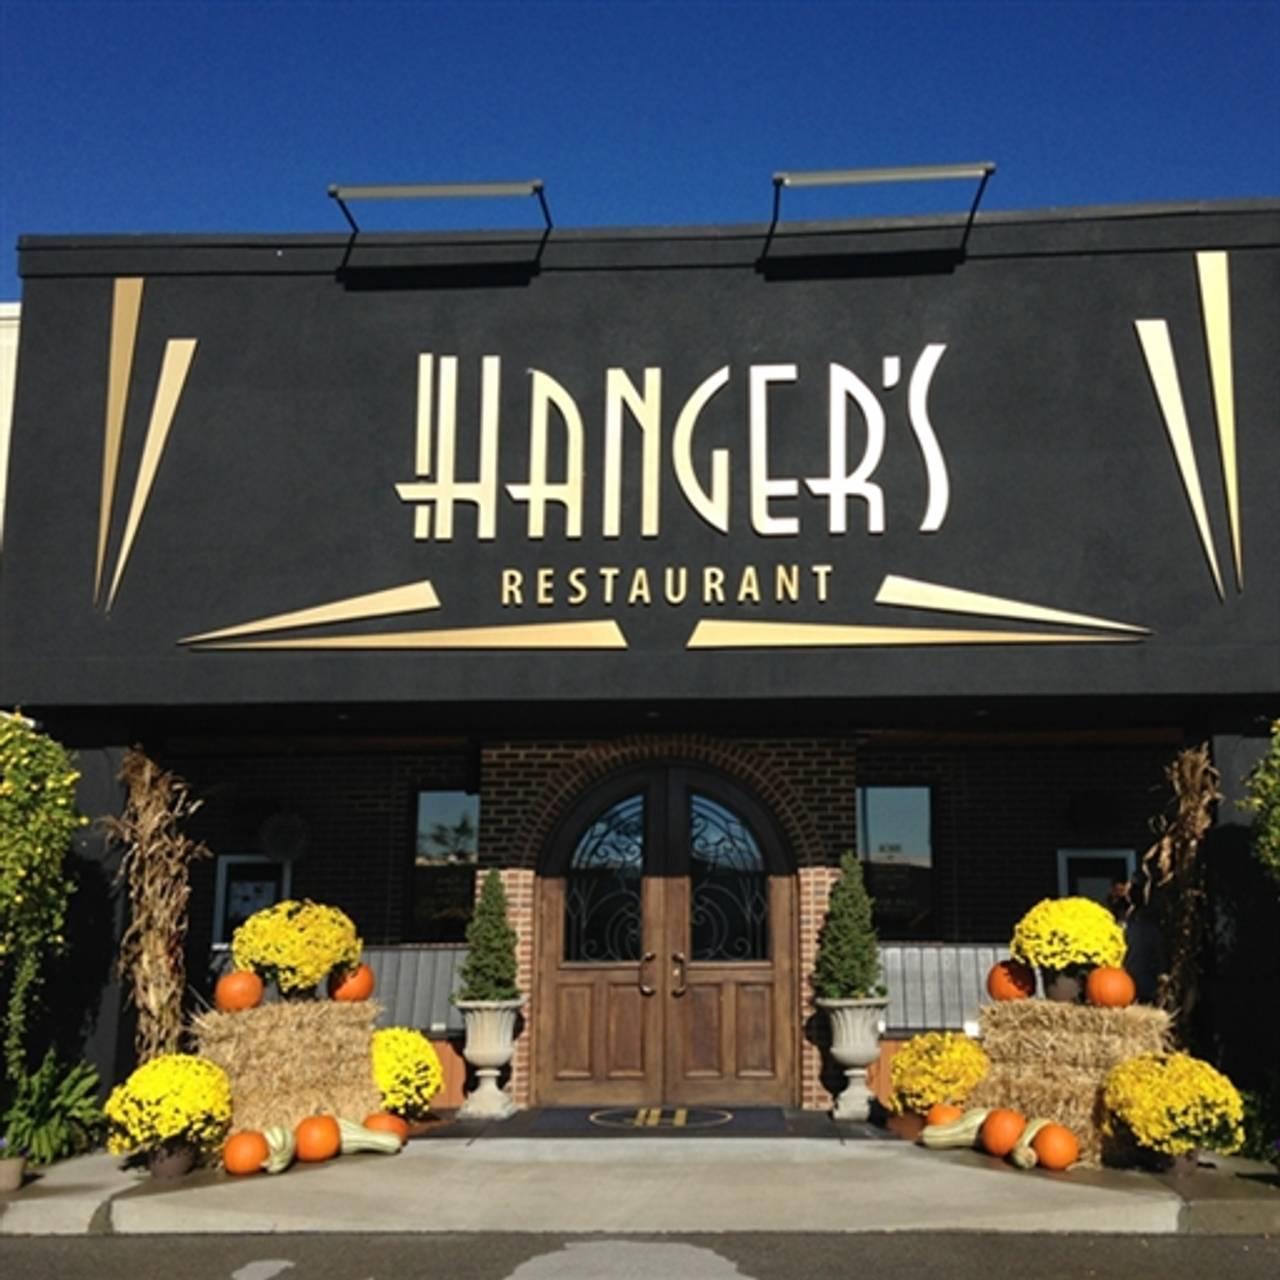 Hangers Restaurant Richmond Ky